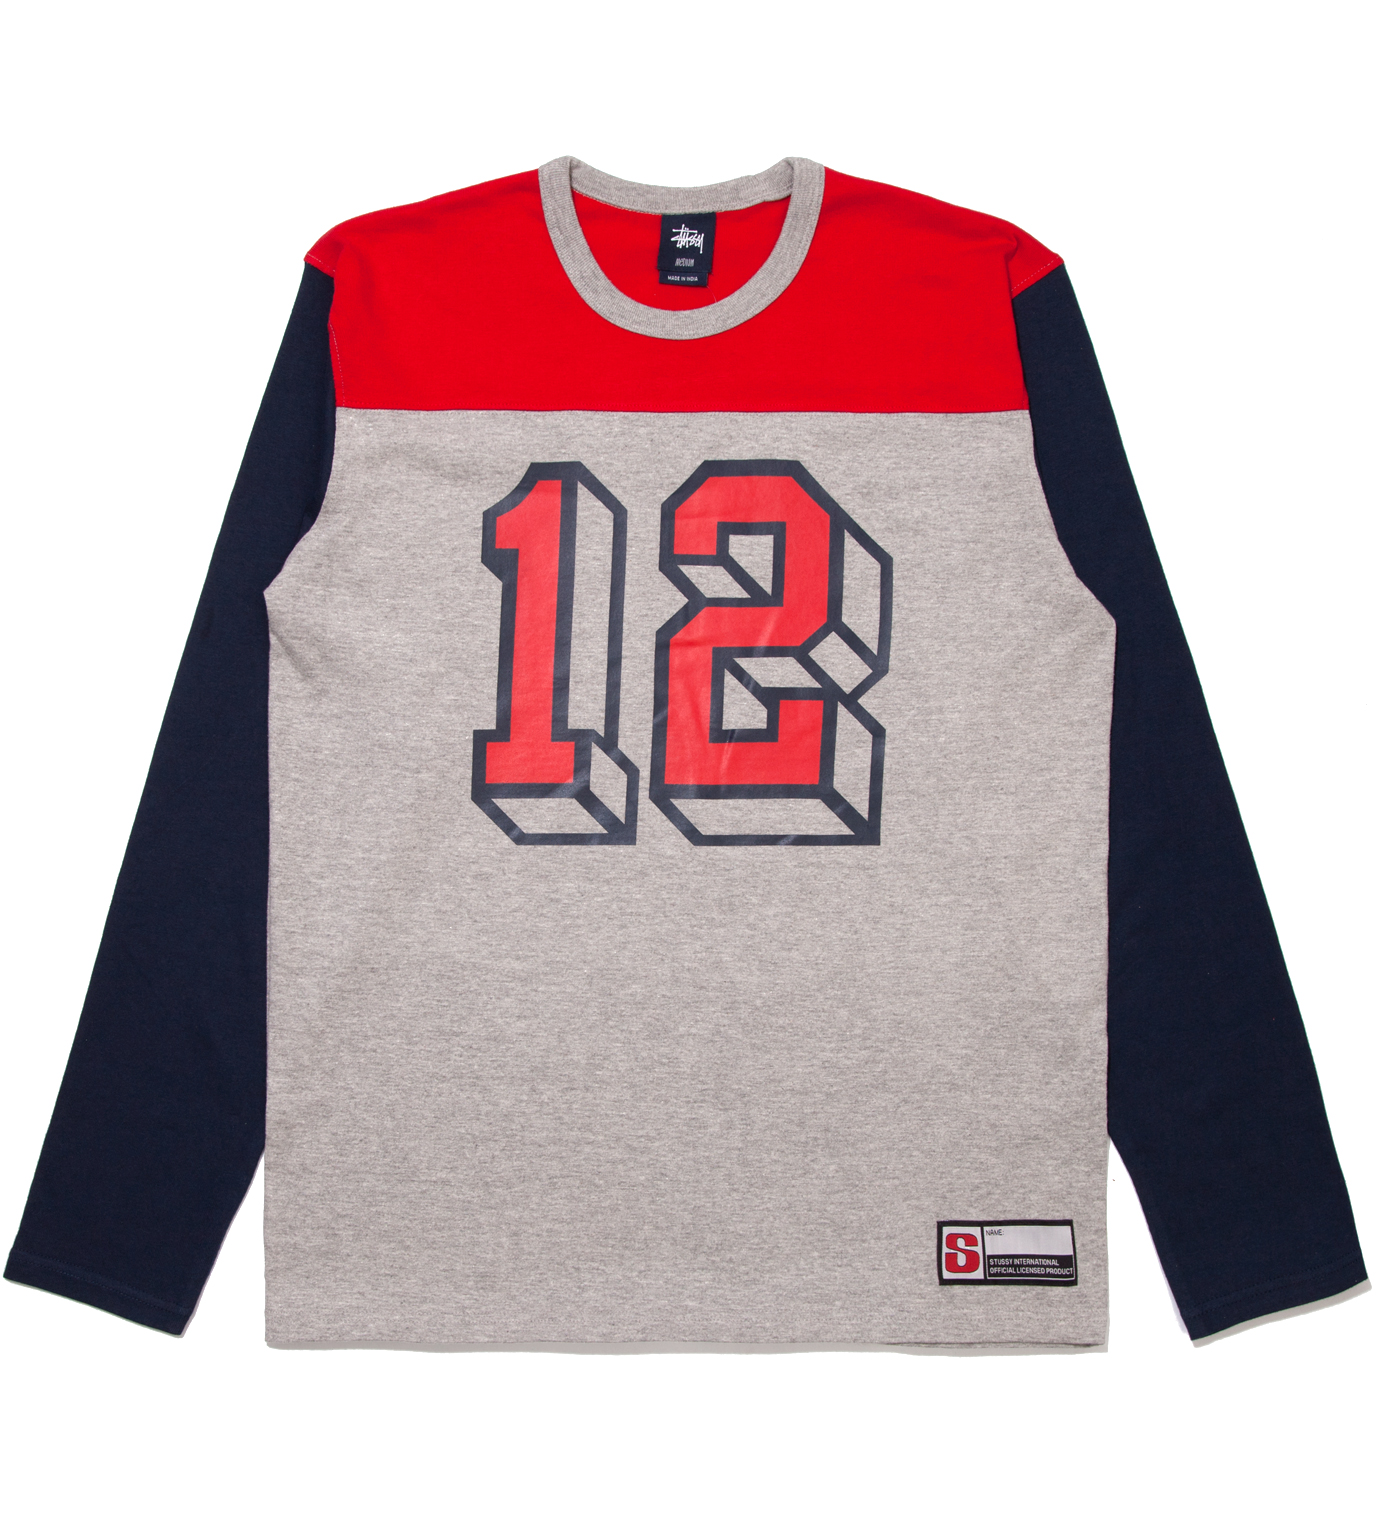 Stussy Grey Heather #12 Football Jersey Long Sleeved T-Shirt